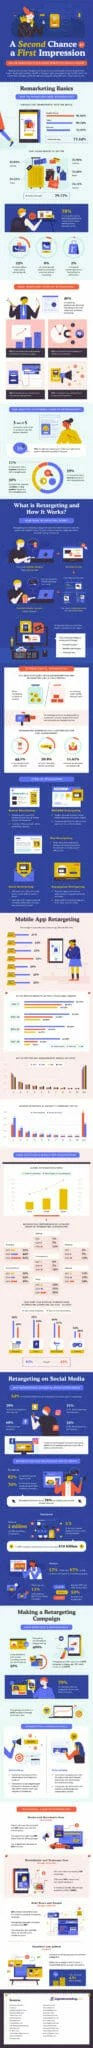 50+ Retargeting Stats - Infographic